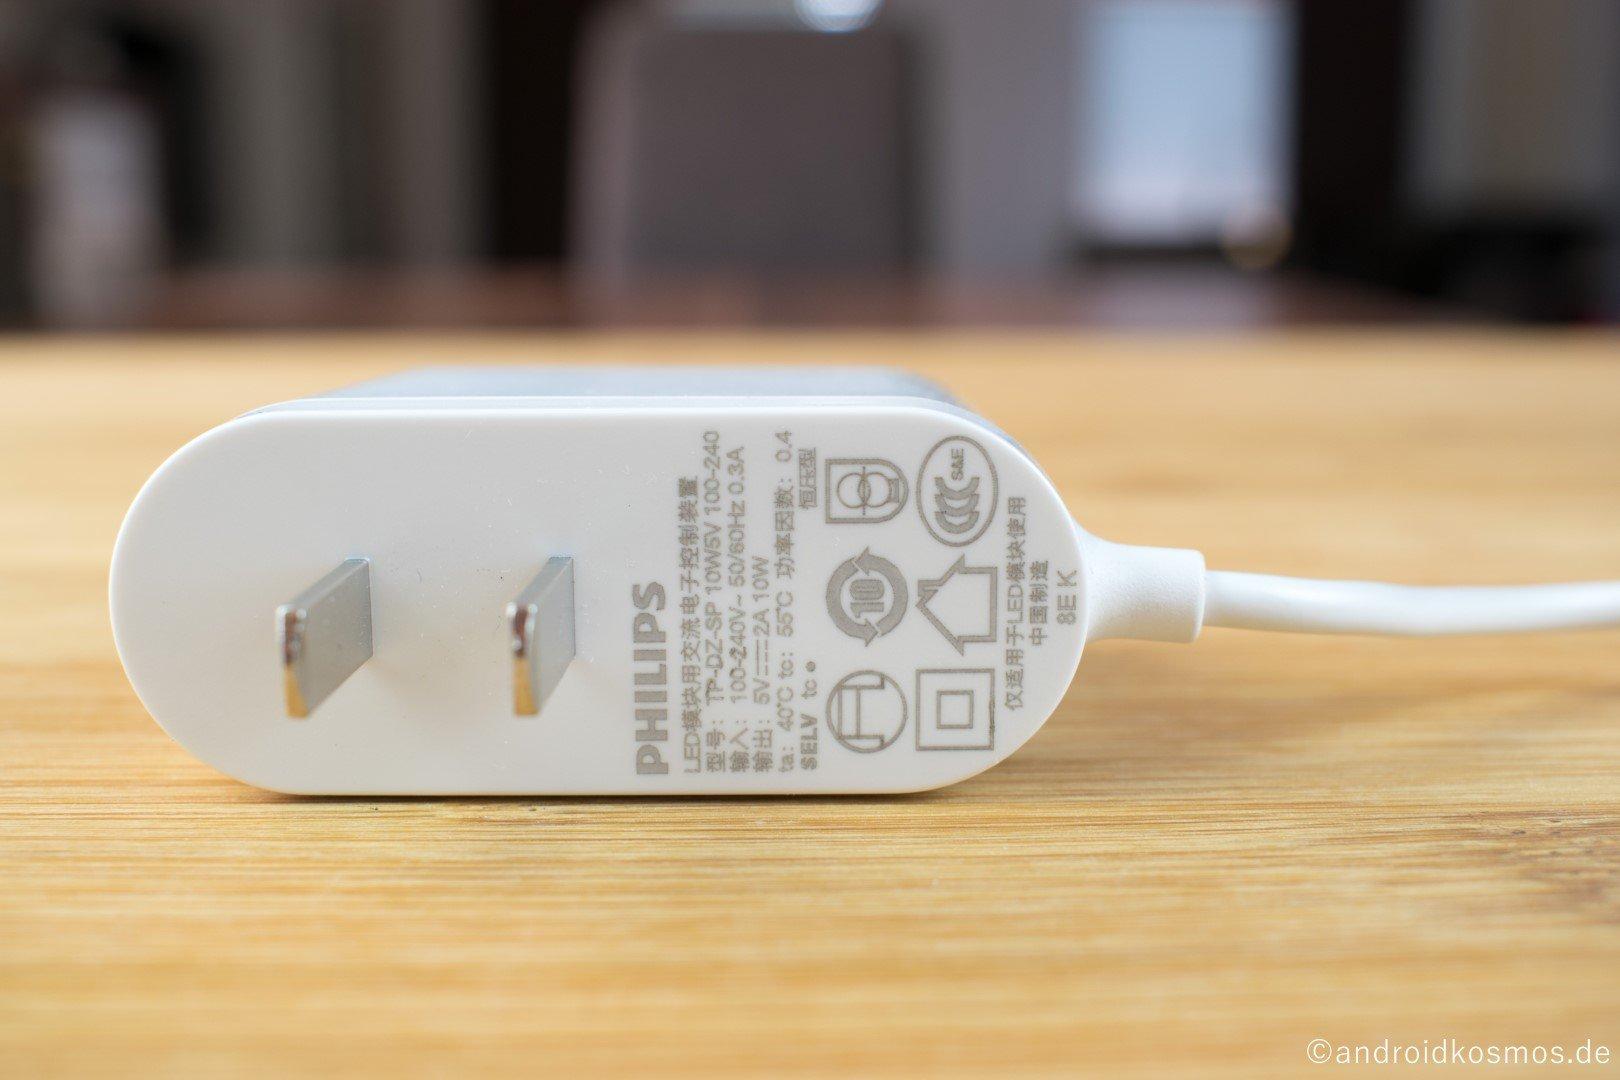 Philips Zhirui AndroidKosmos.de 3641